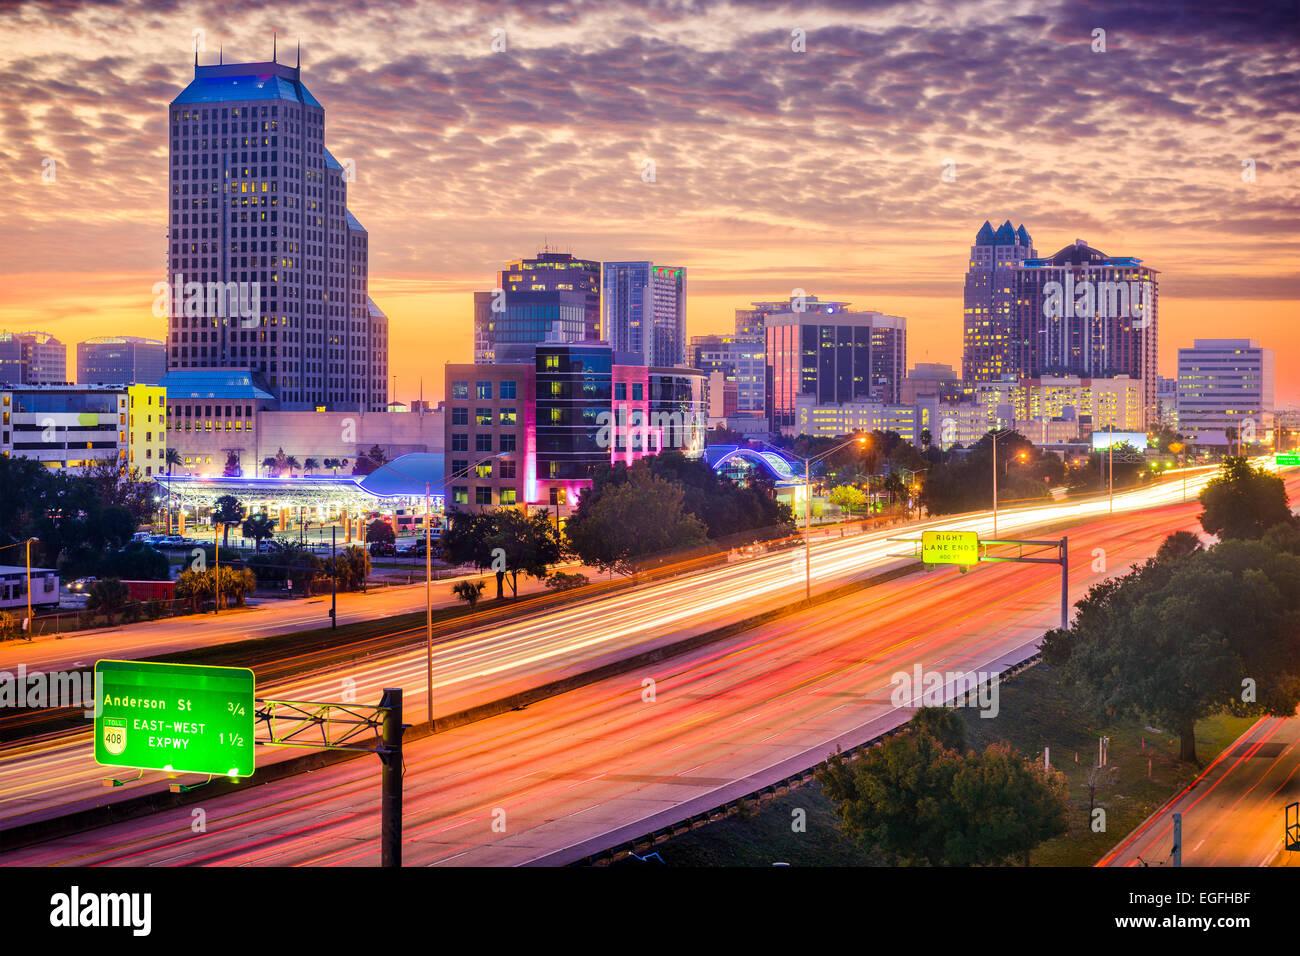 Orlando, Florida, USA cityscape. - Stock Image